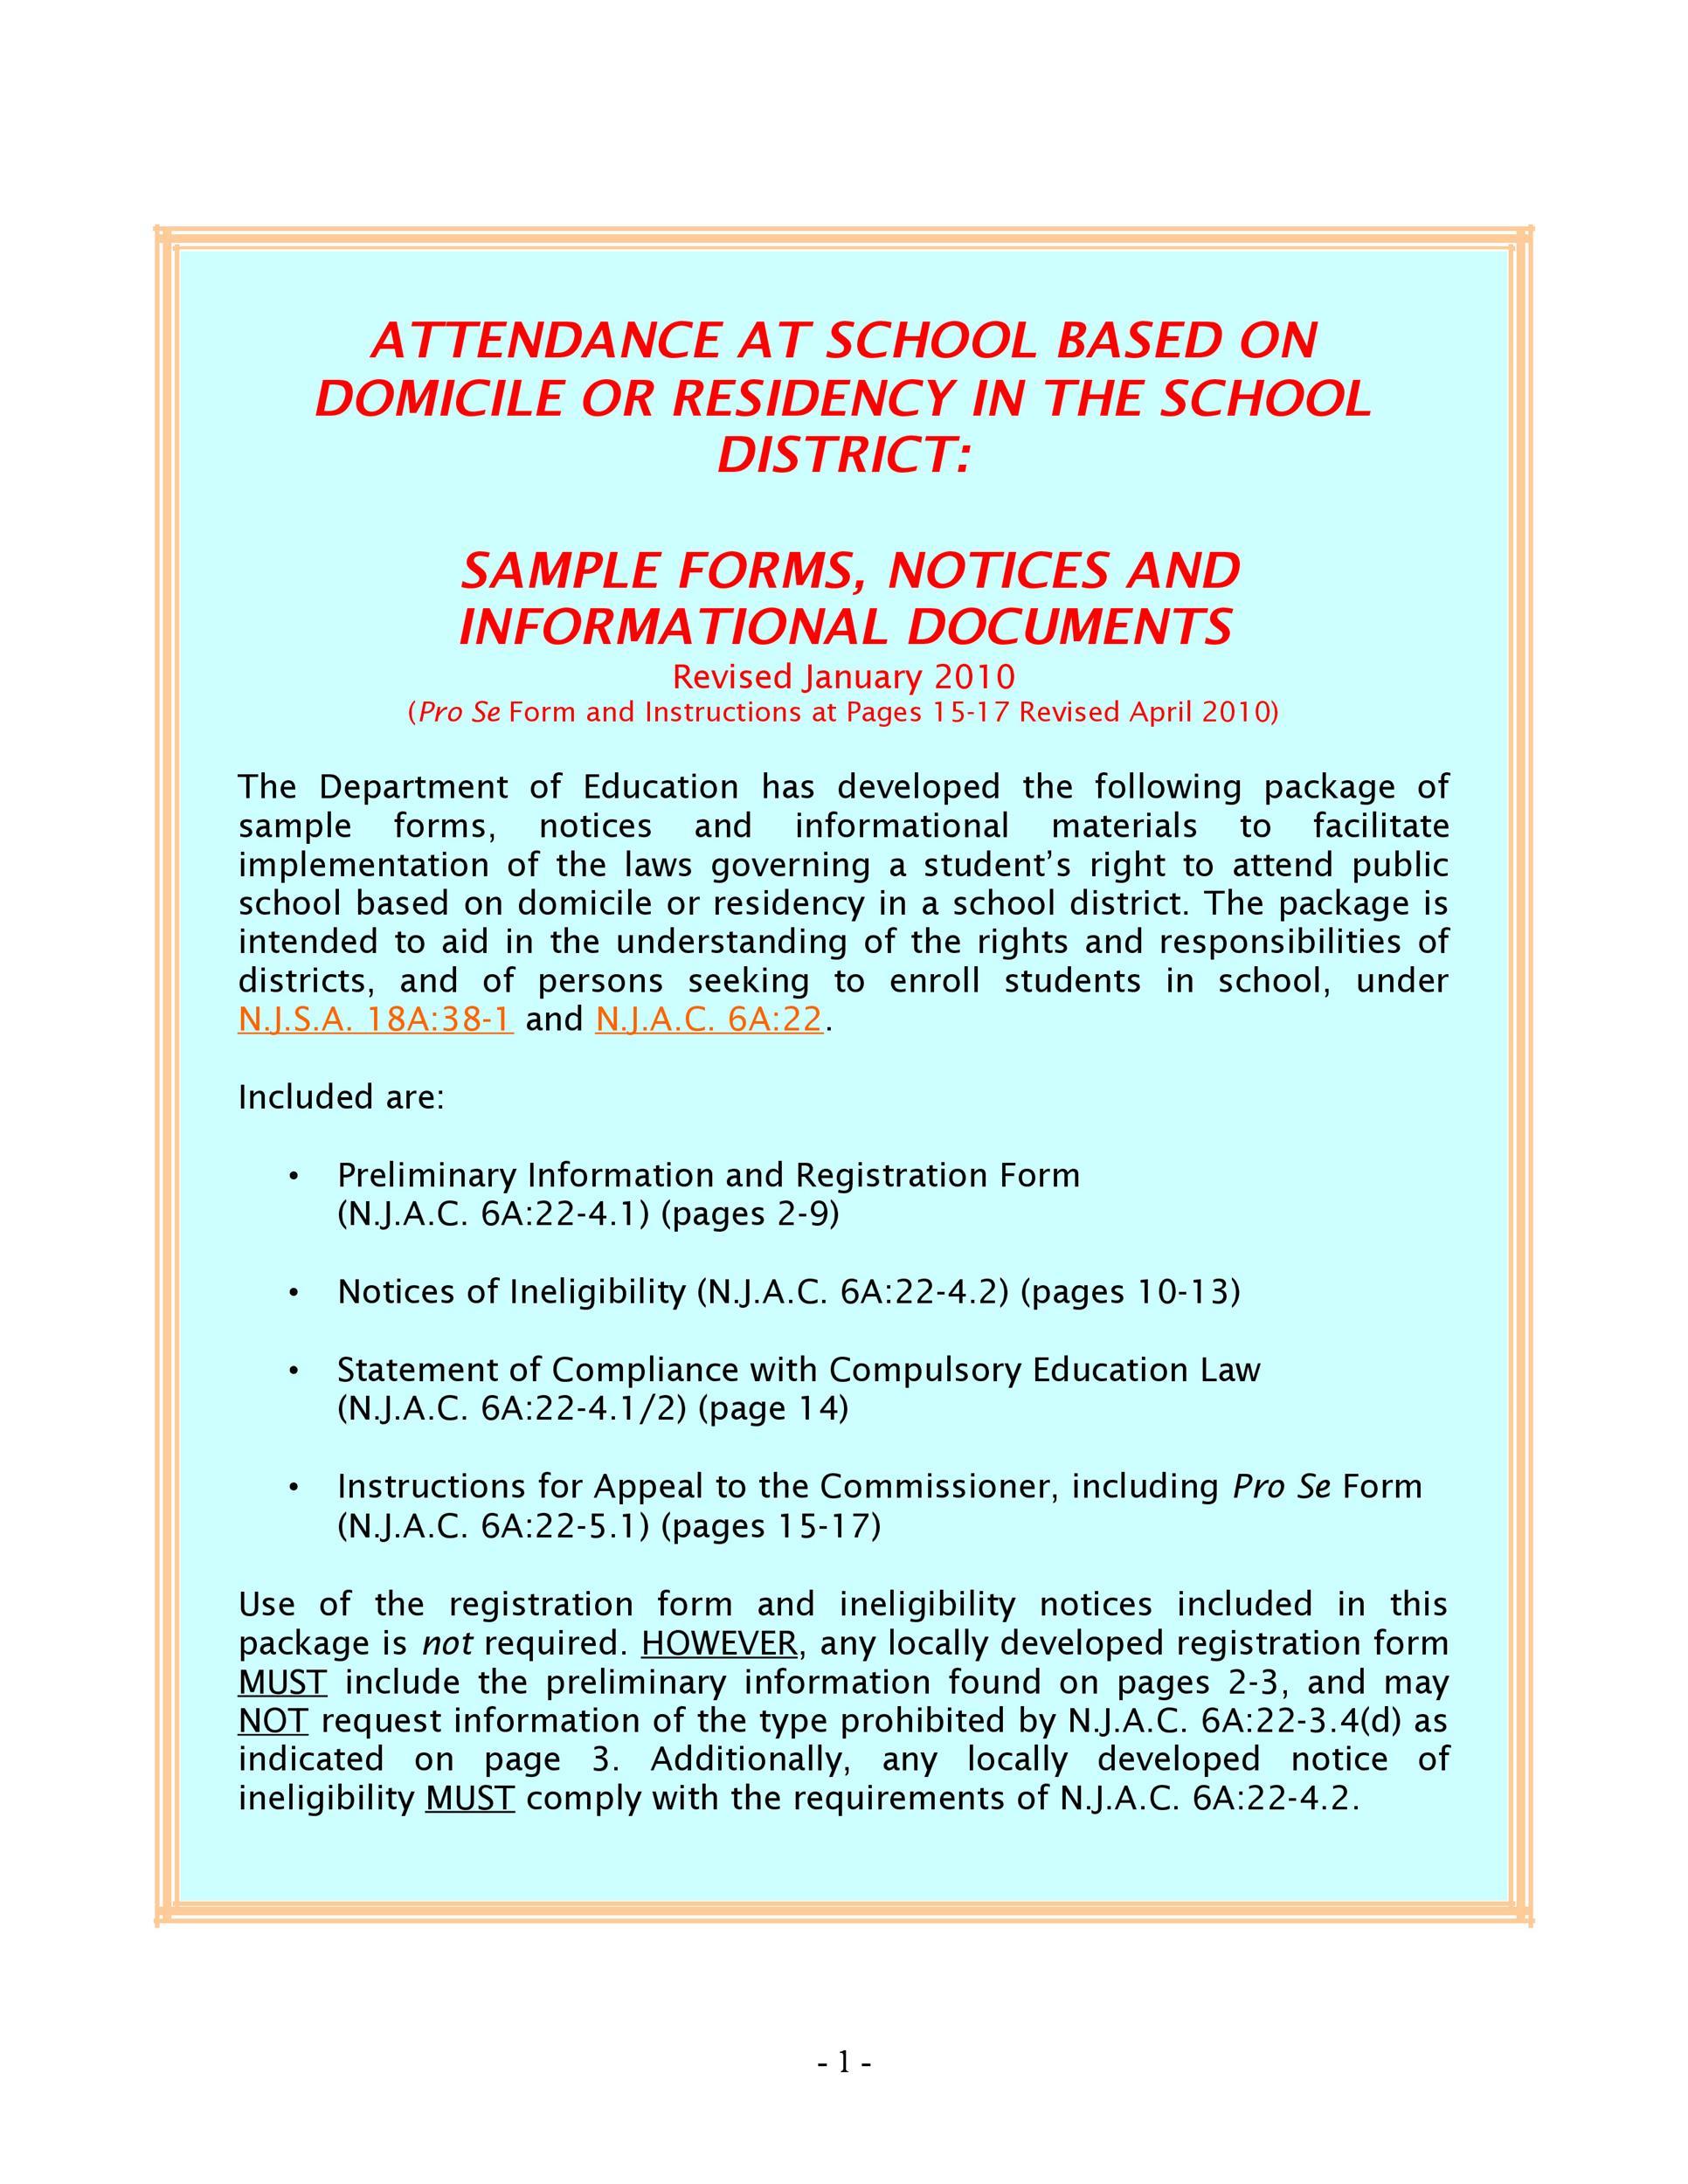 Free affidavit of domicile 31